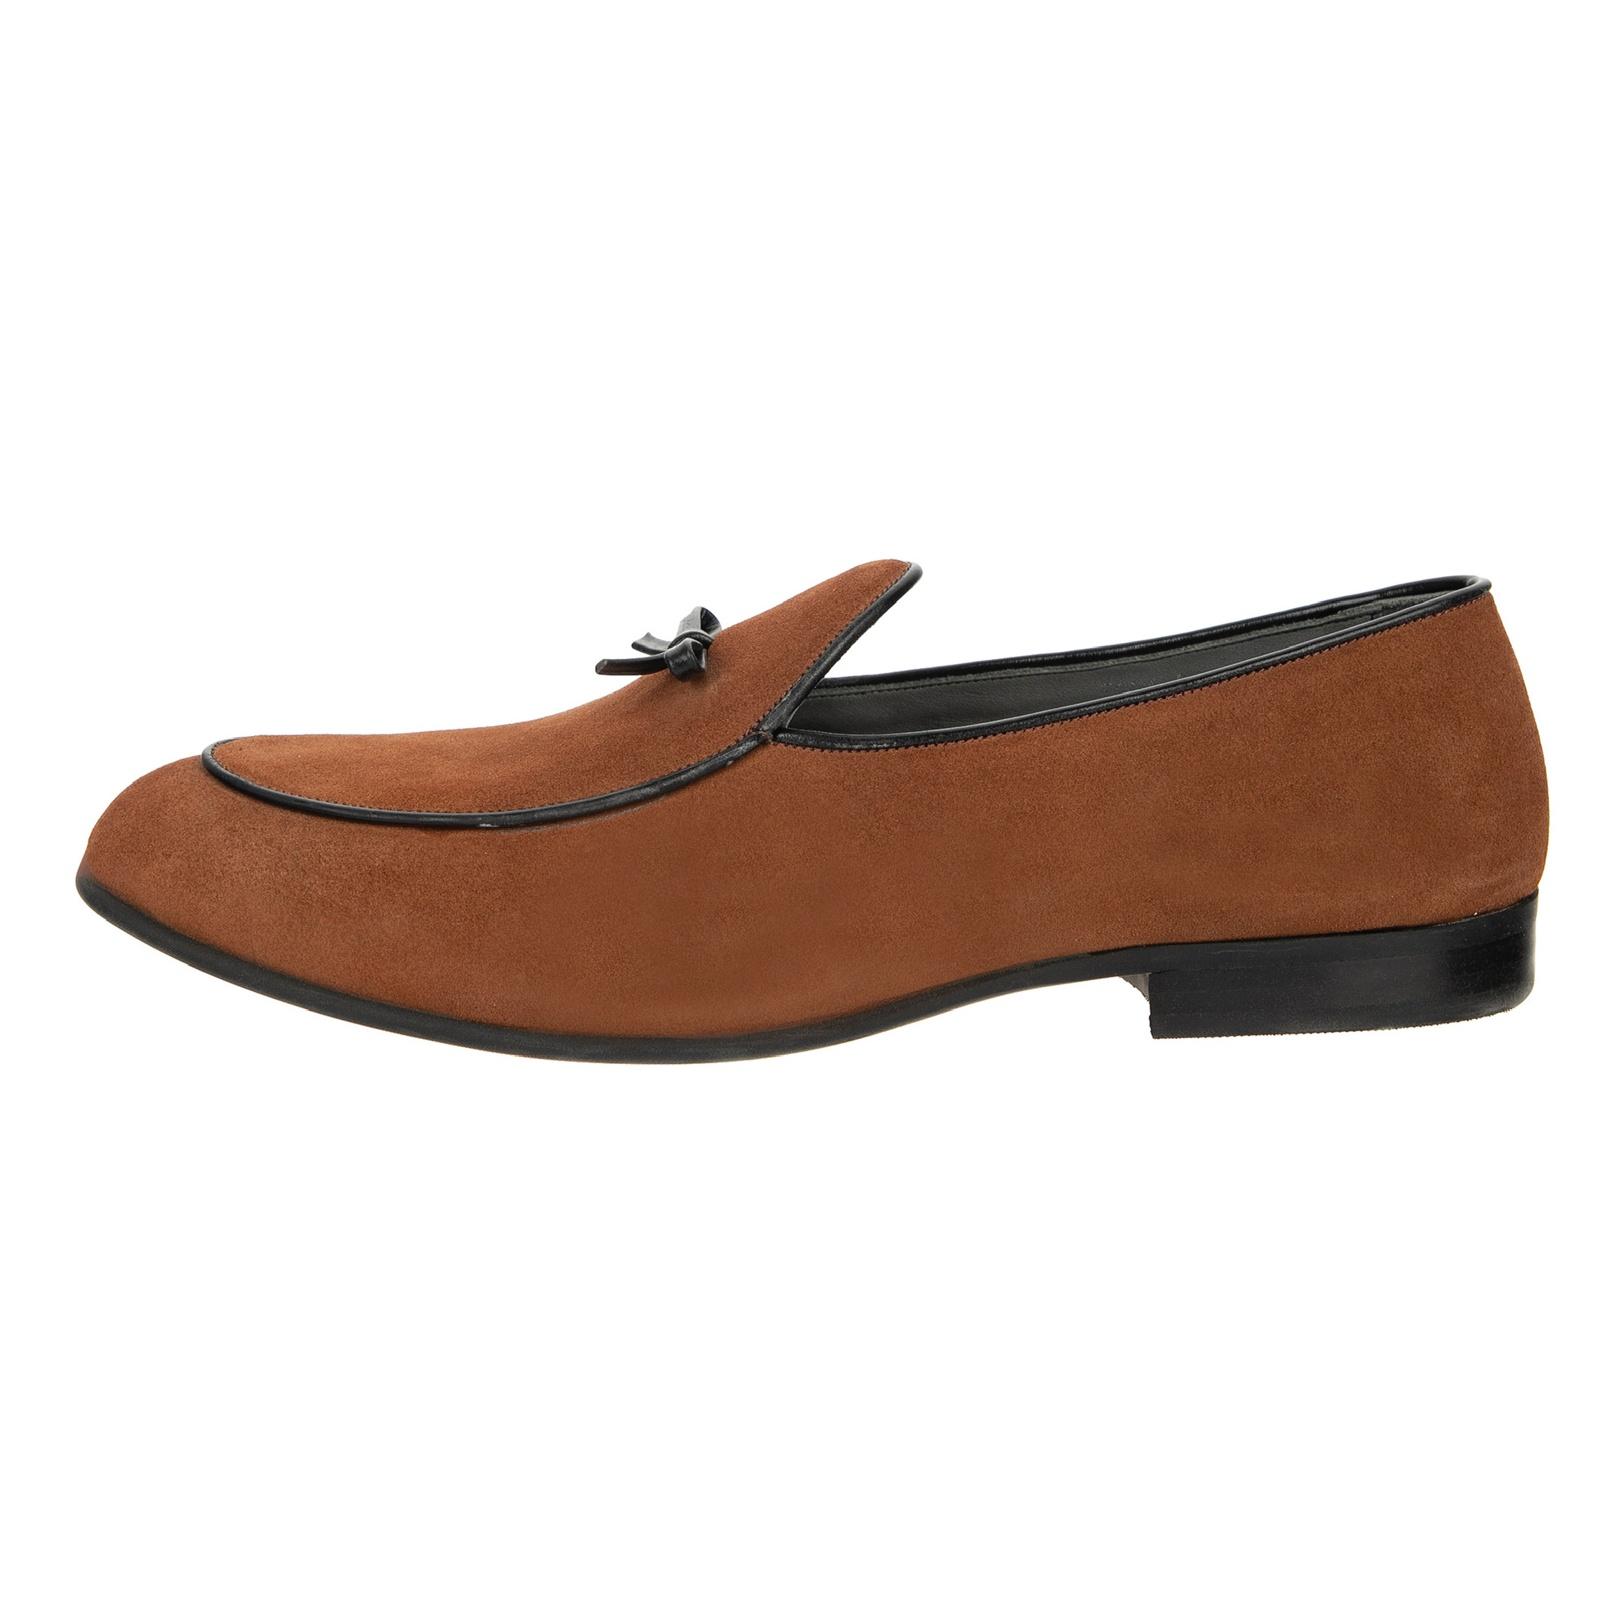 کفش روزمره مردانه جندقی مدل ss.1910007